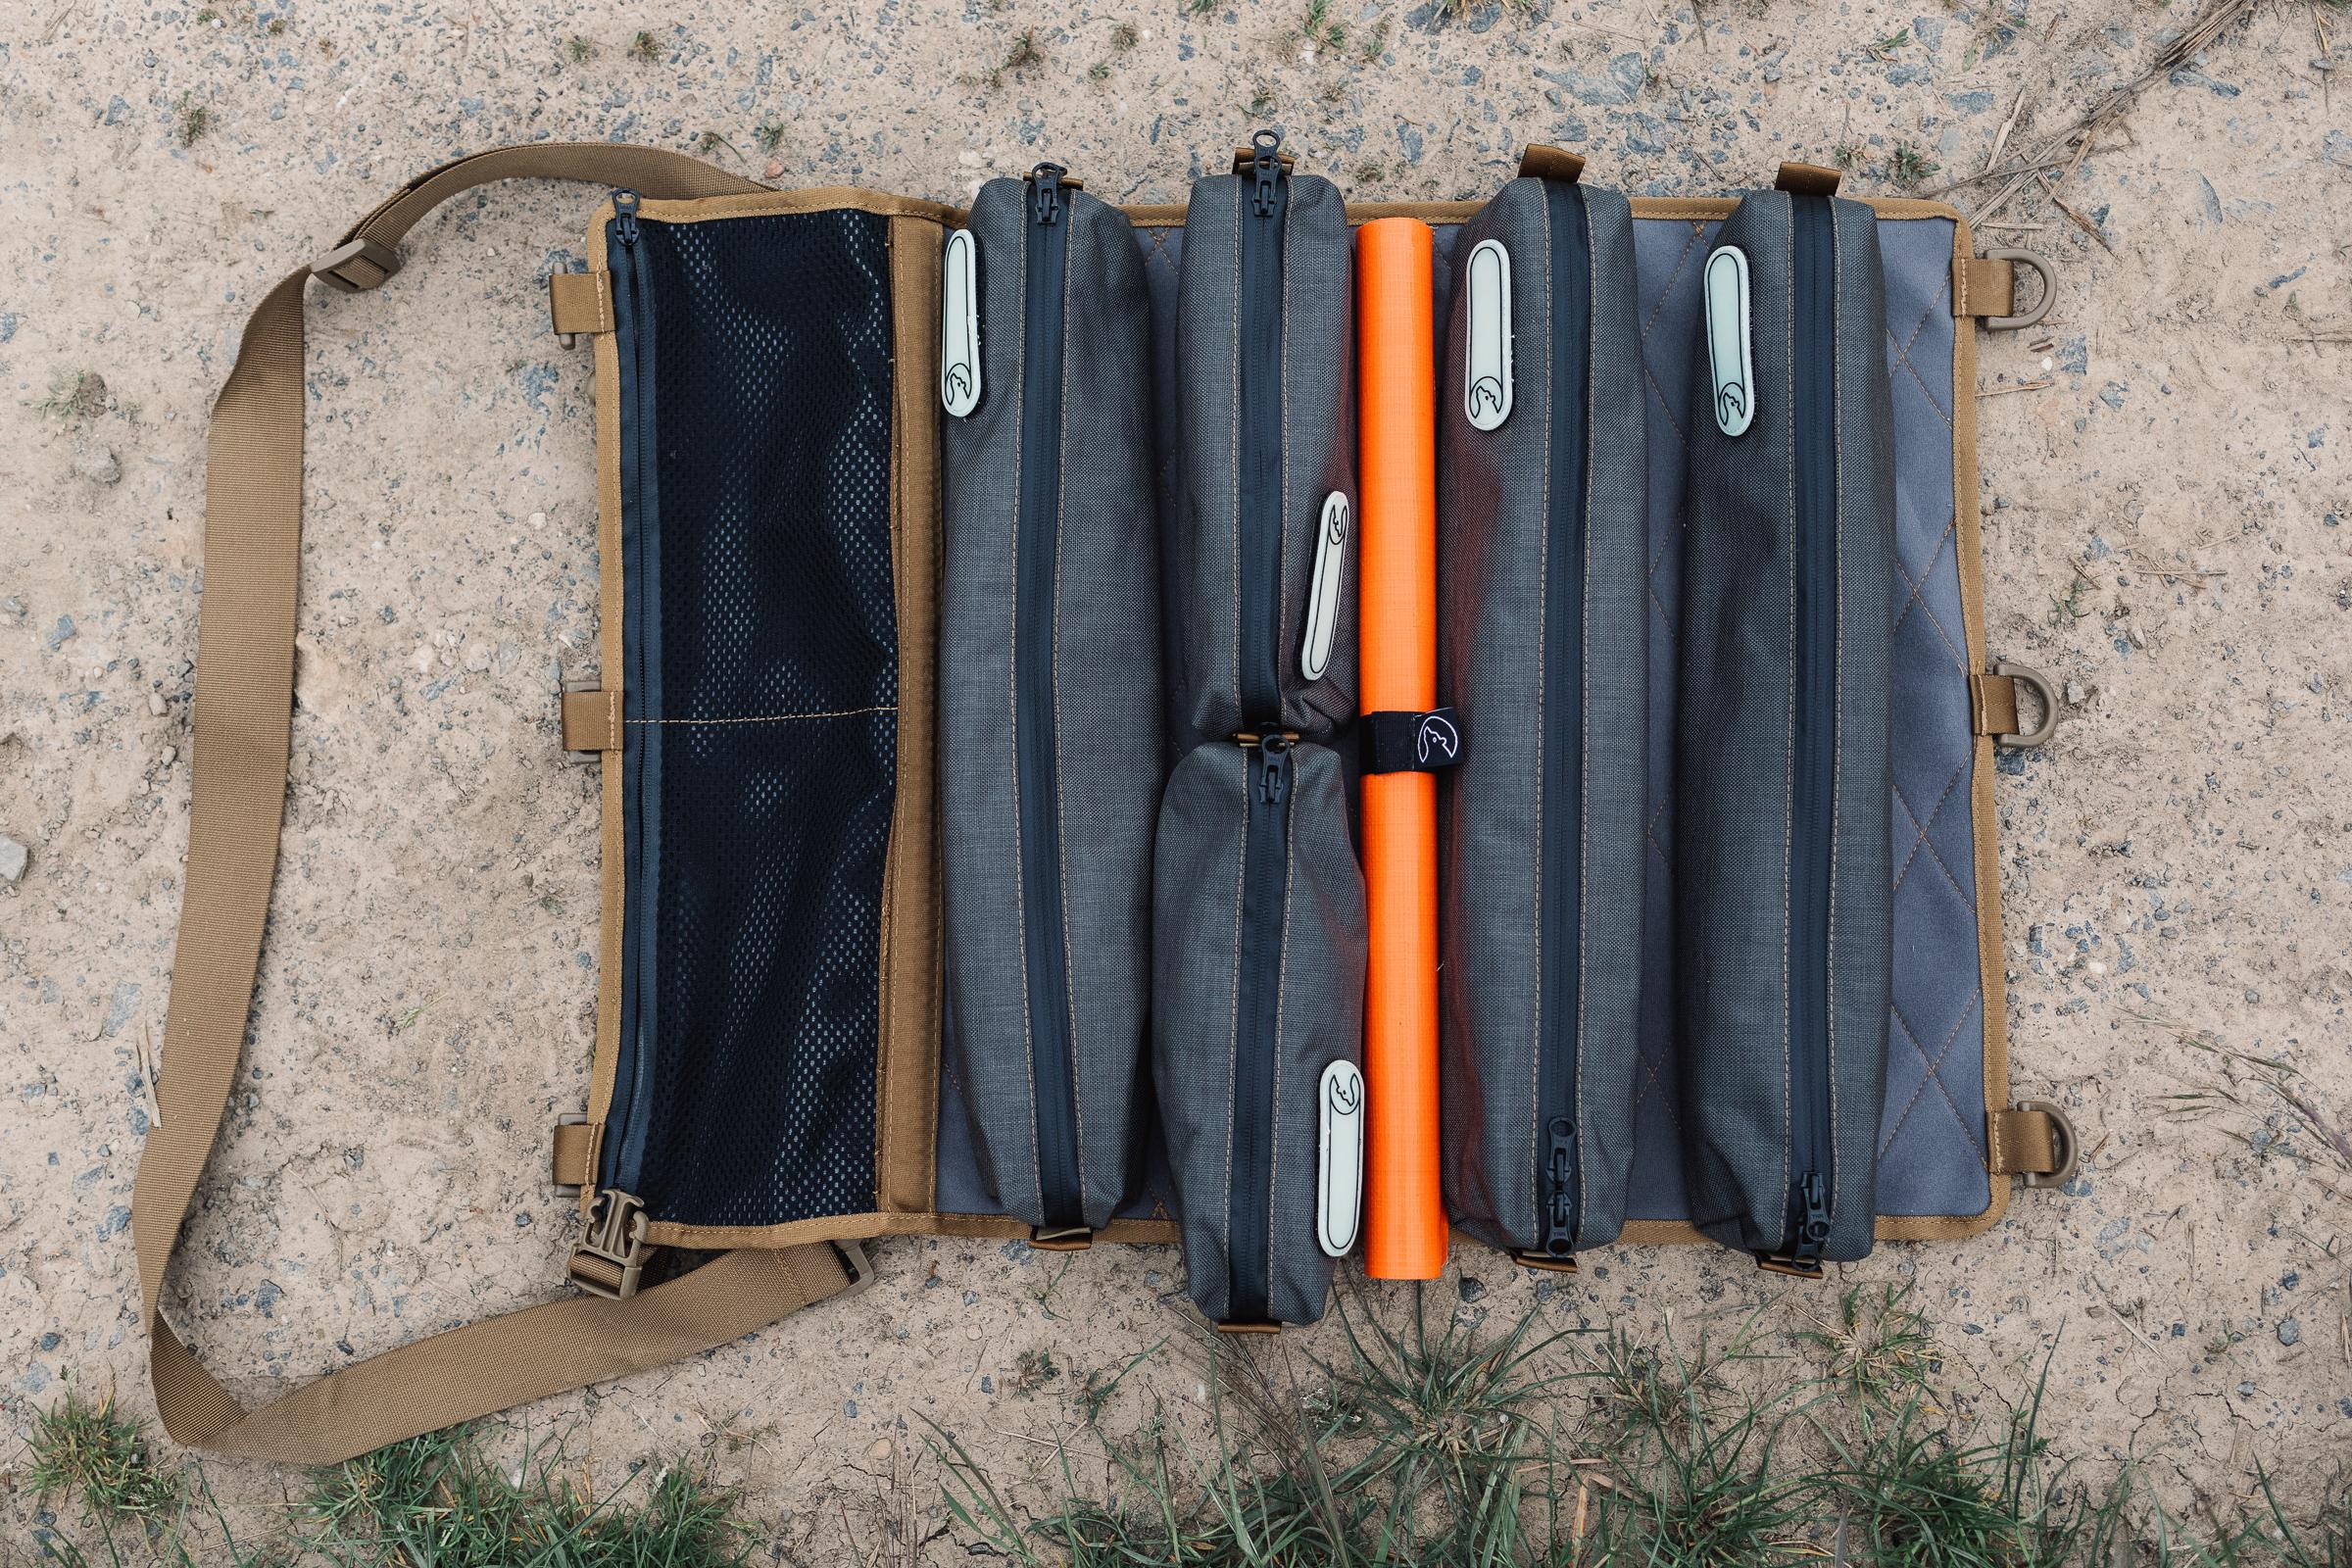 Werkzeugtasche Tool-Roll von Nakatanenga - Alles sauber verstaut.